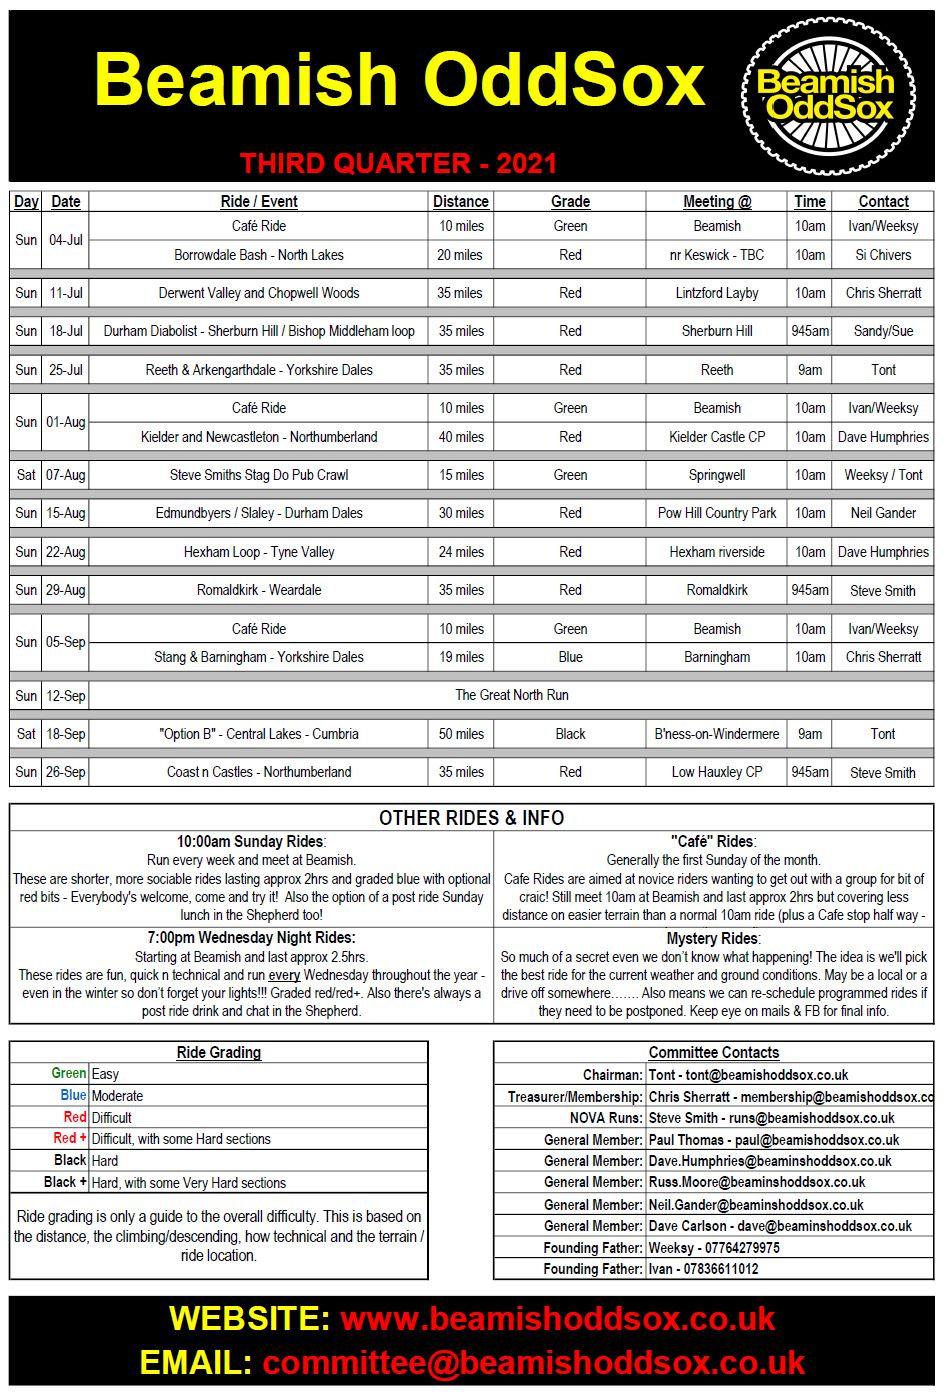 2021Q3 OddSox Programme.JPG